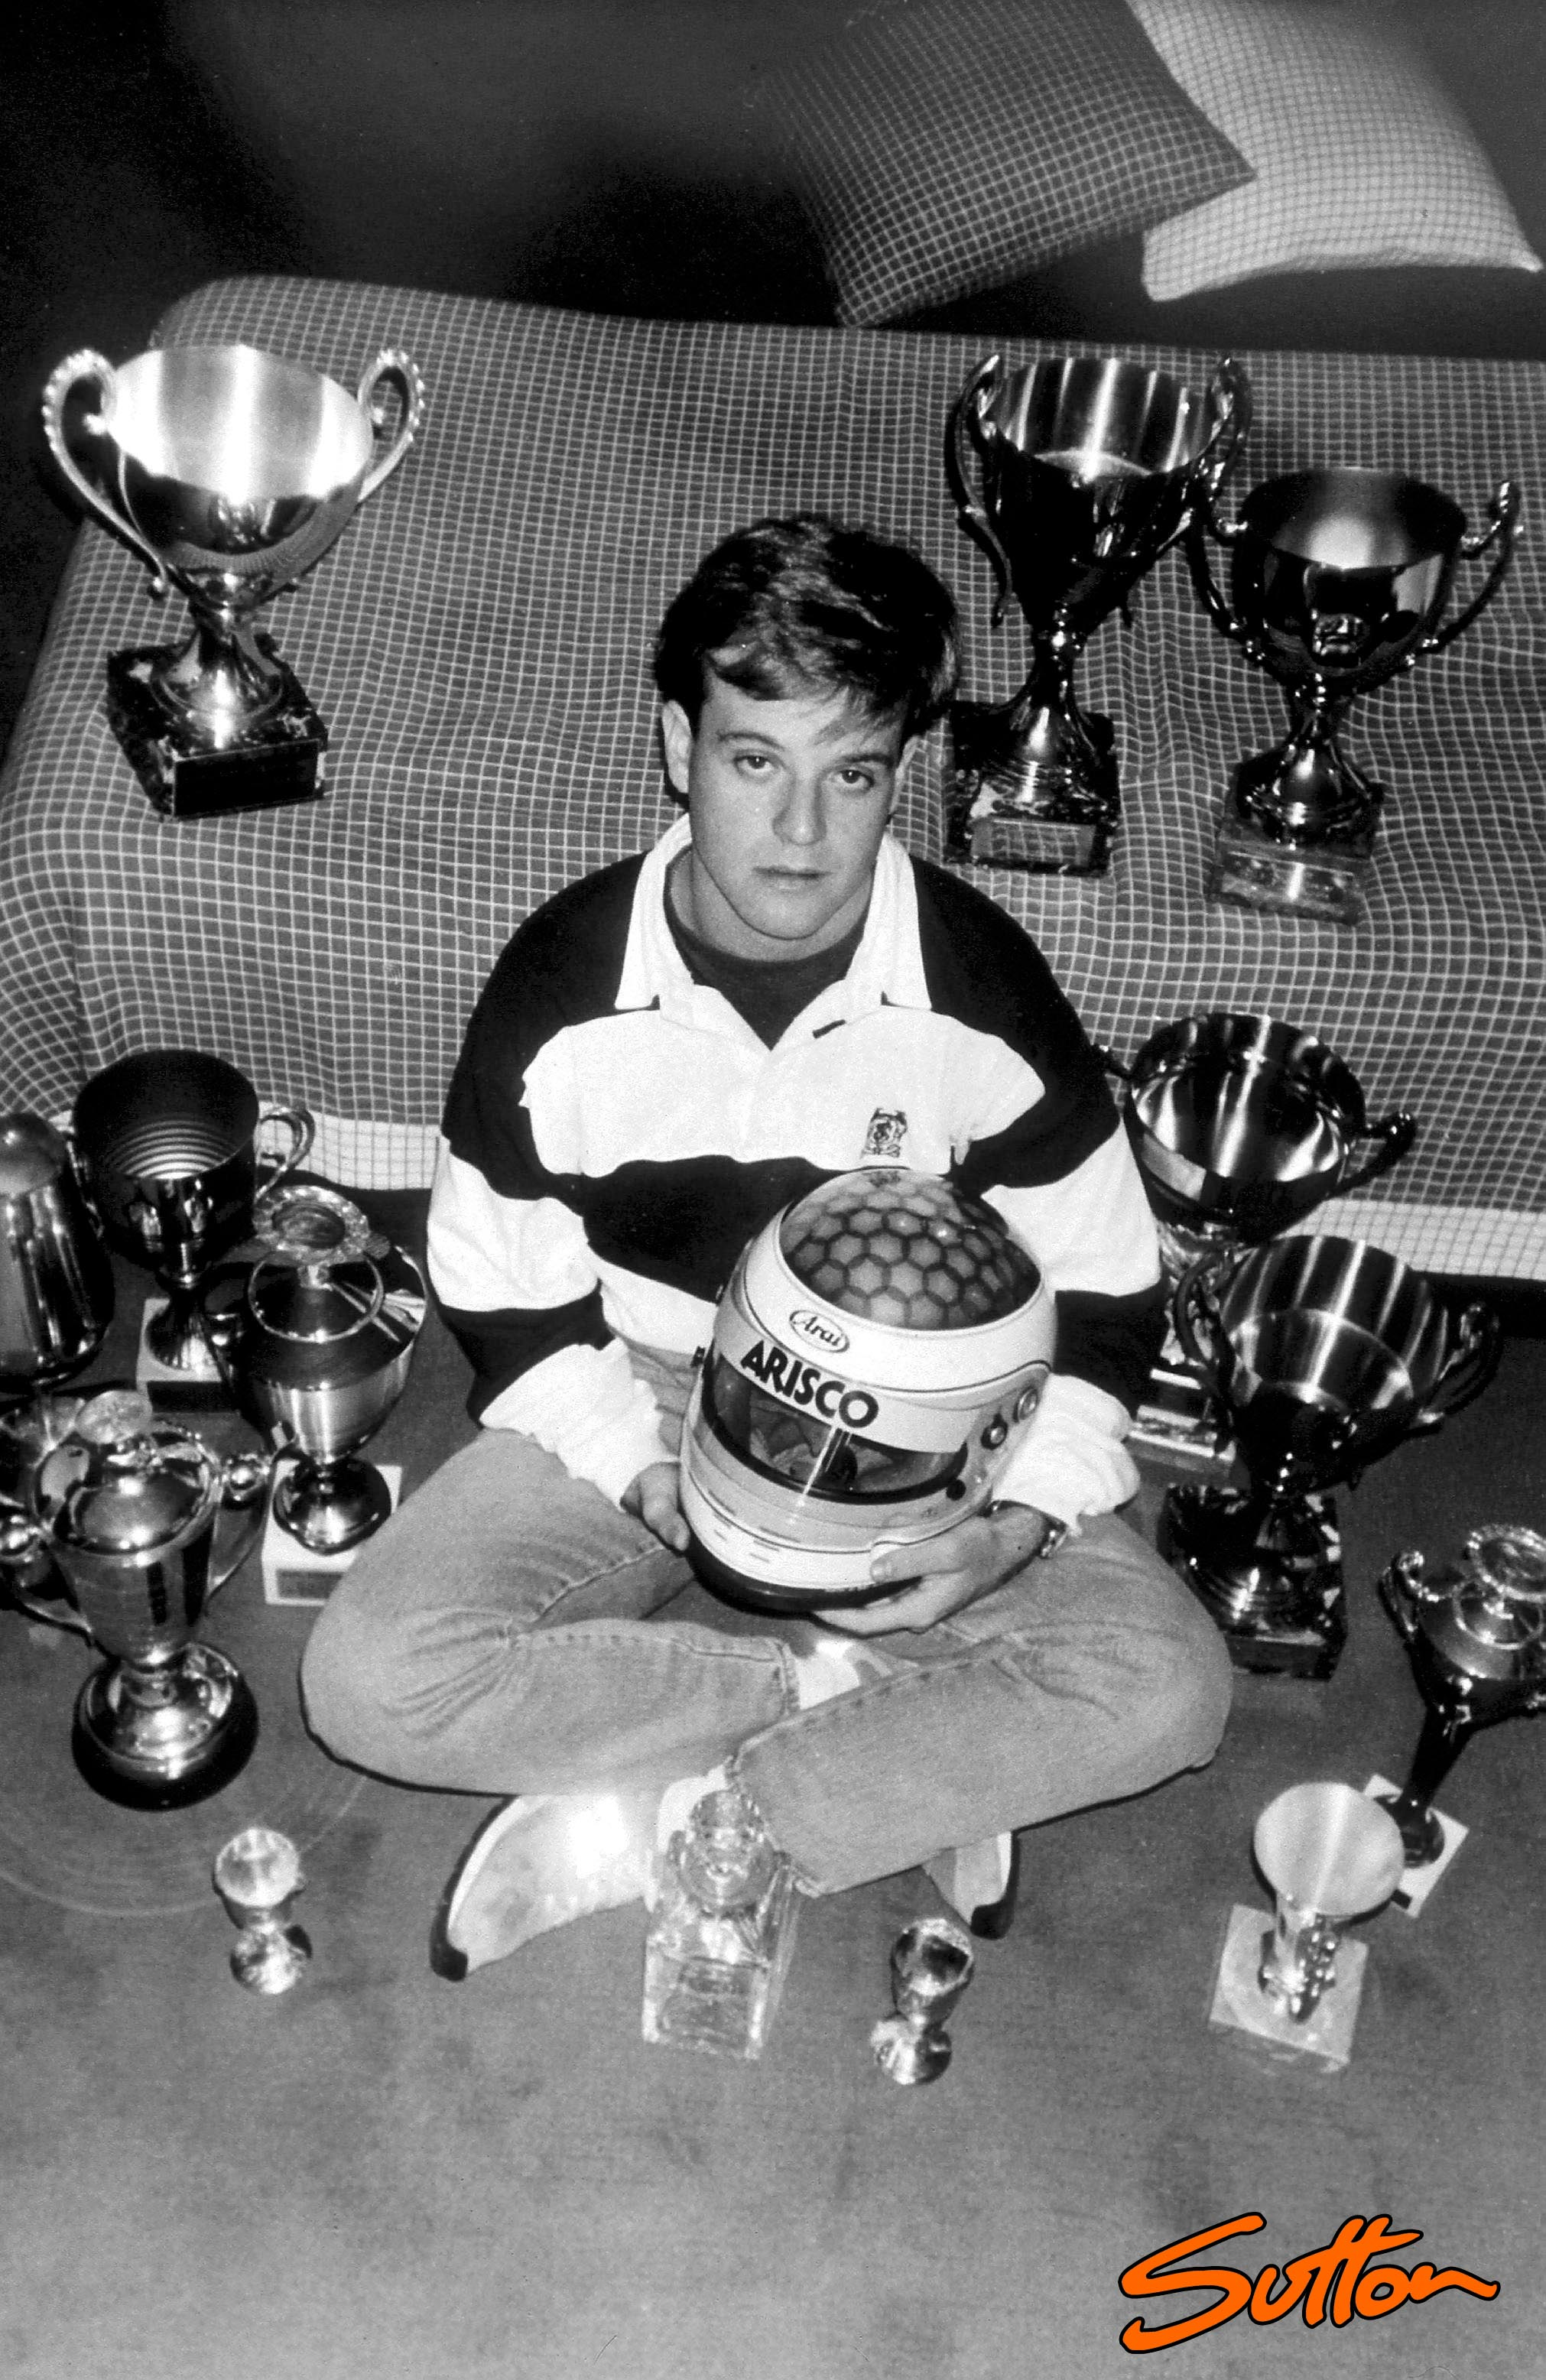 Rubens Barrichello childhood photo one at Motorsportretro.com